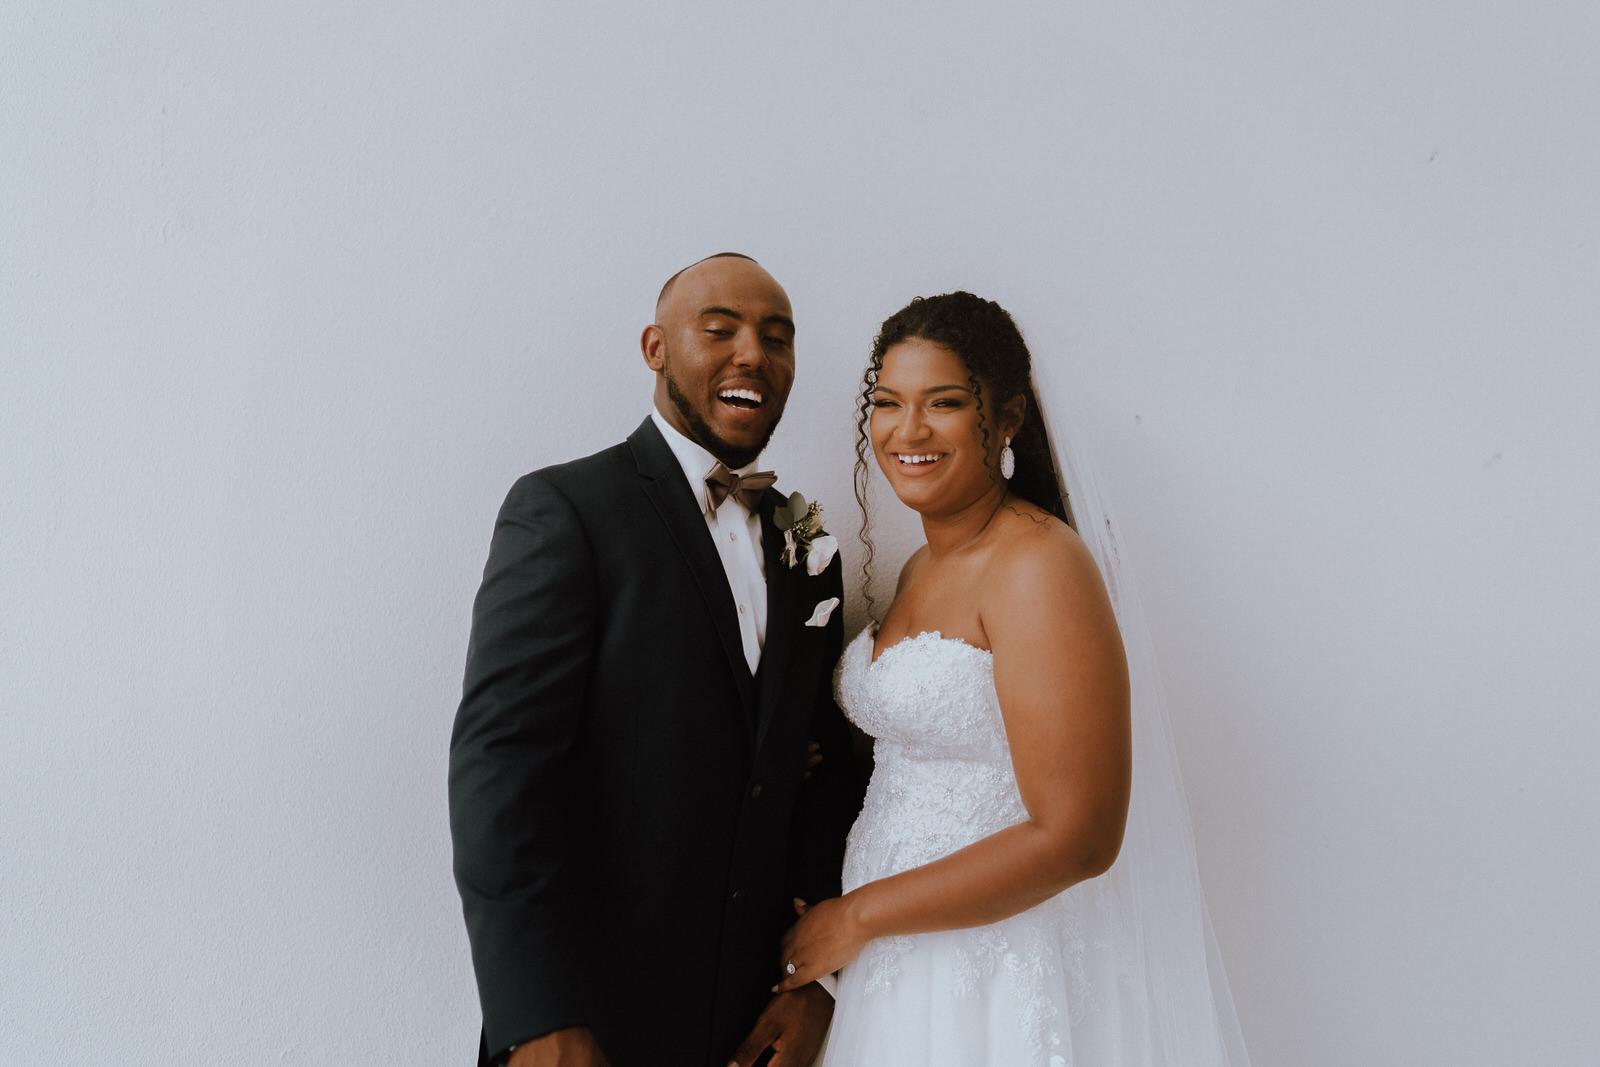 South Seas Island Resort Elopement- Alyana and Shawn- Michelle Gonzalez Photography-299.JPG